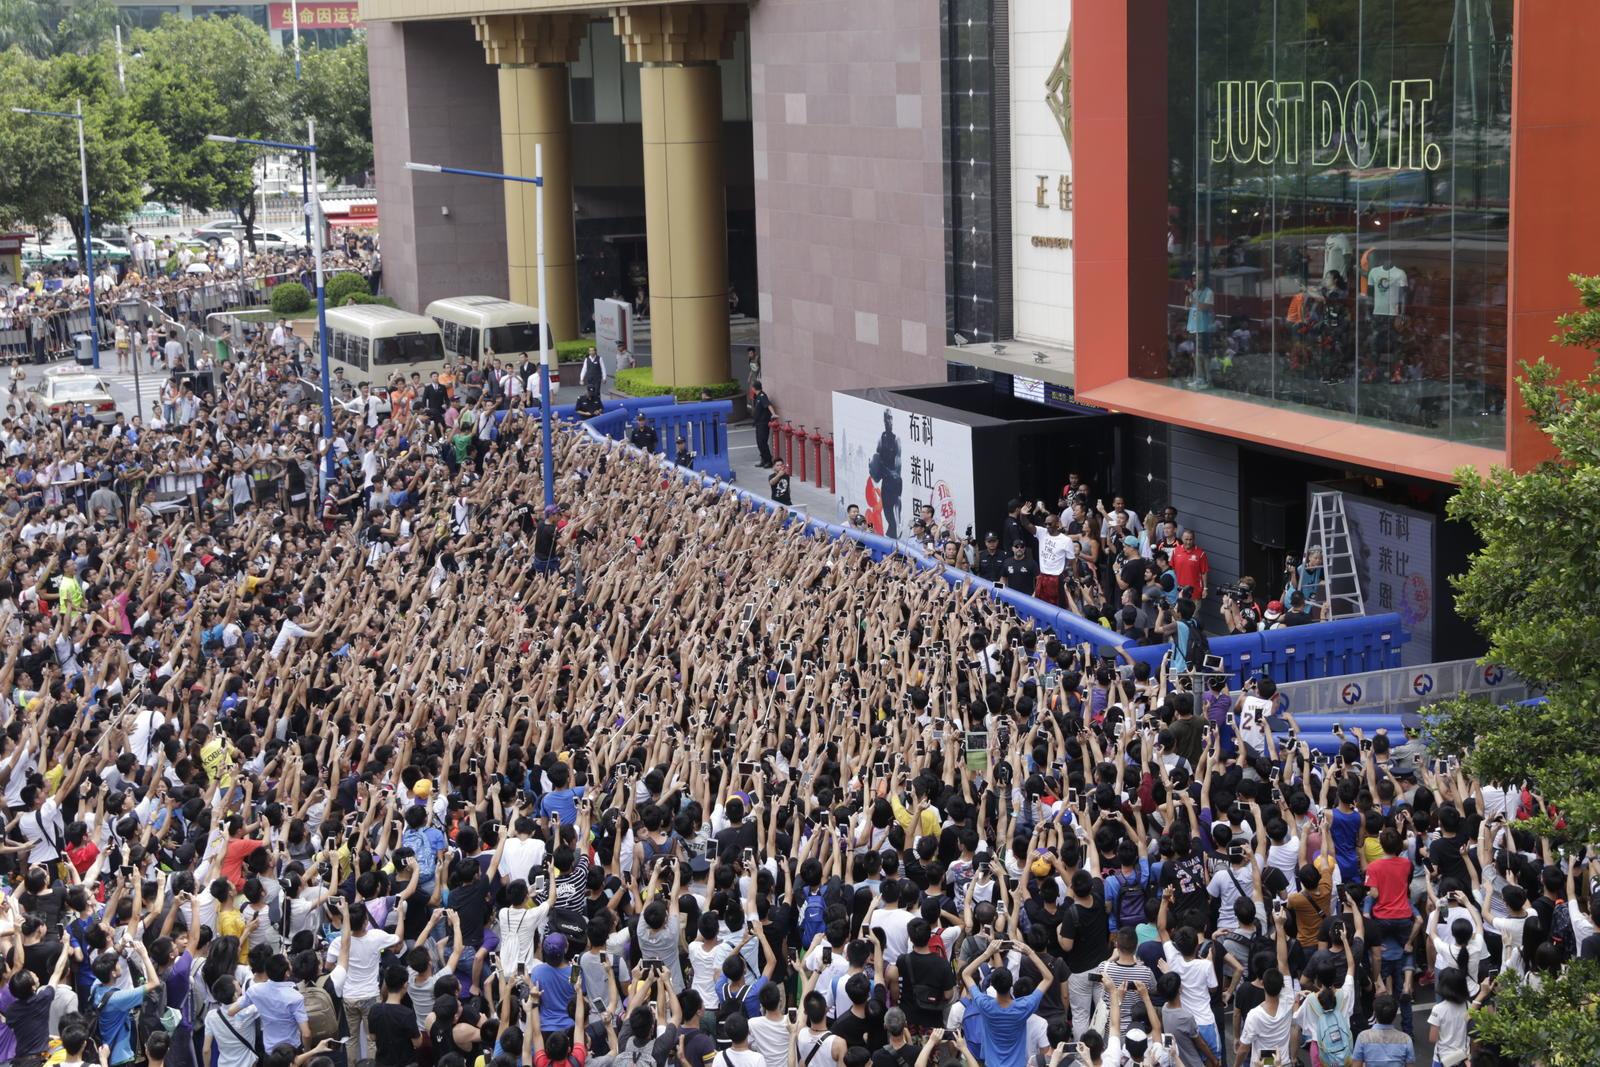 Hundreds Of Fans Greet The Black Mamba Kobe Bryant Outside Nike Store In